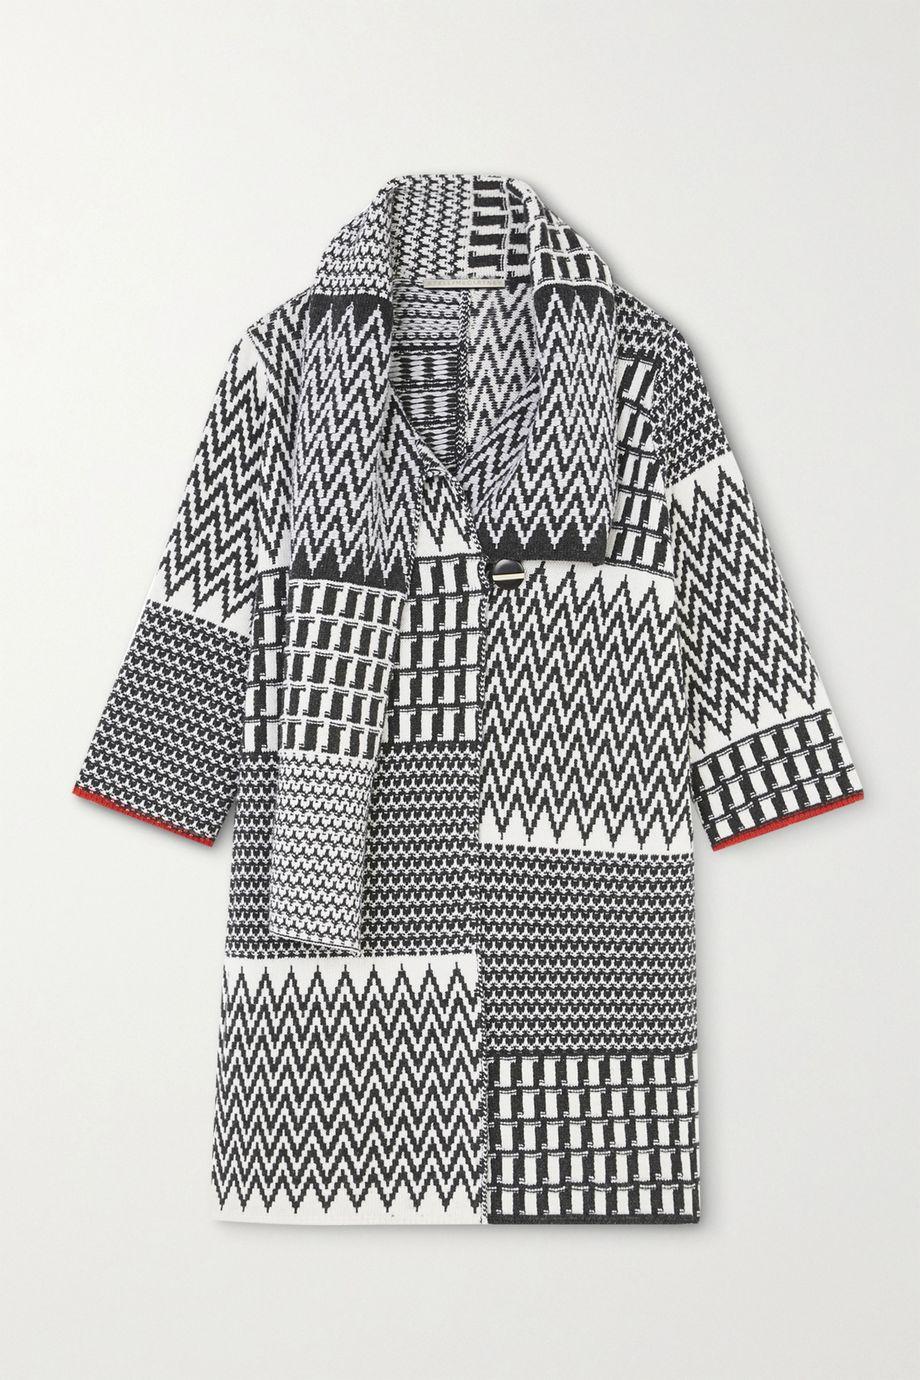 Stella McCartney Jacquard-knit virgin wool coat